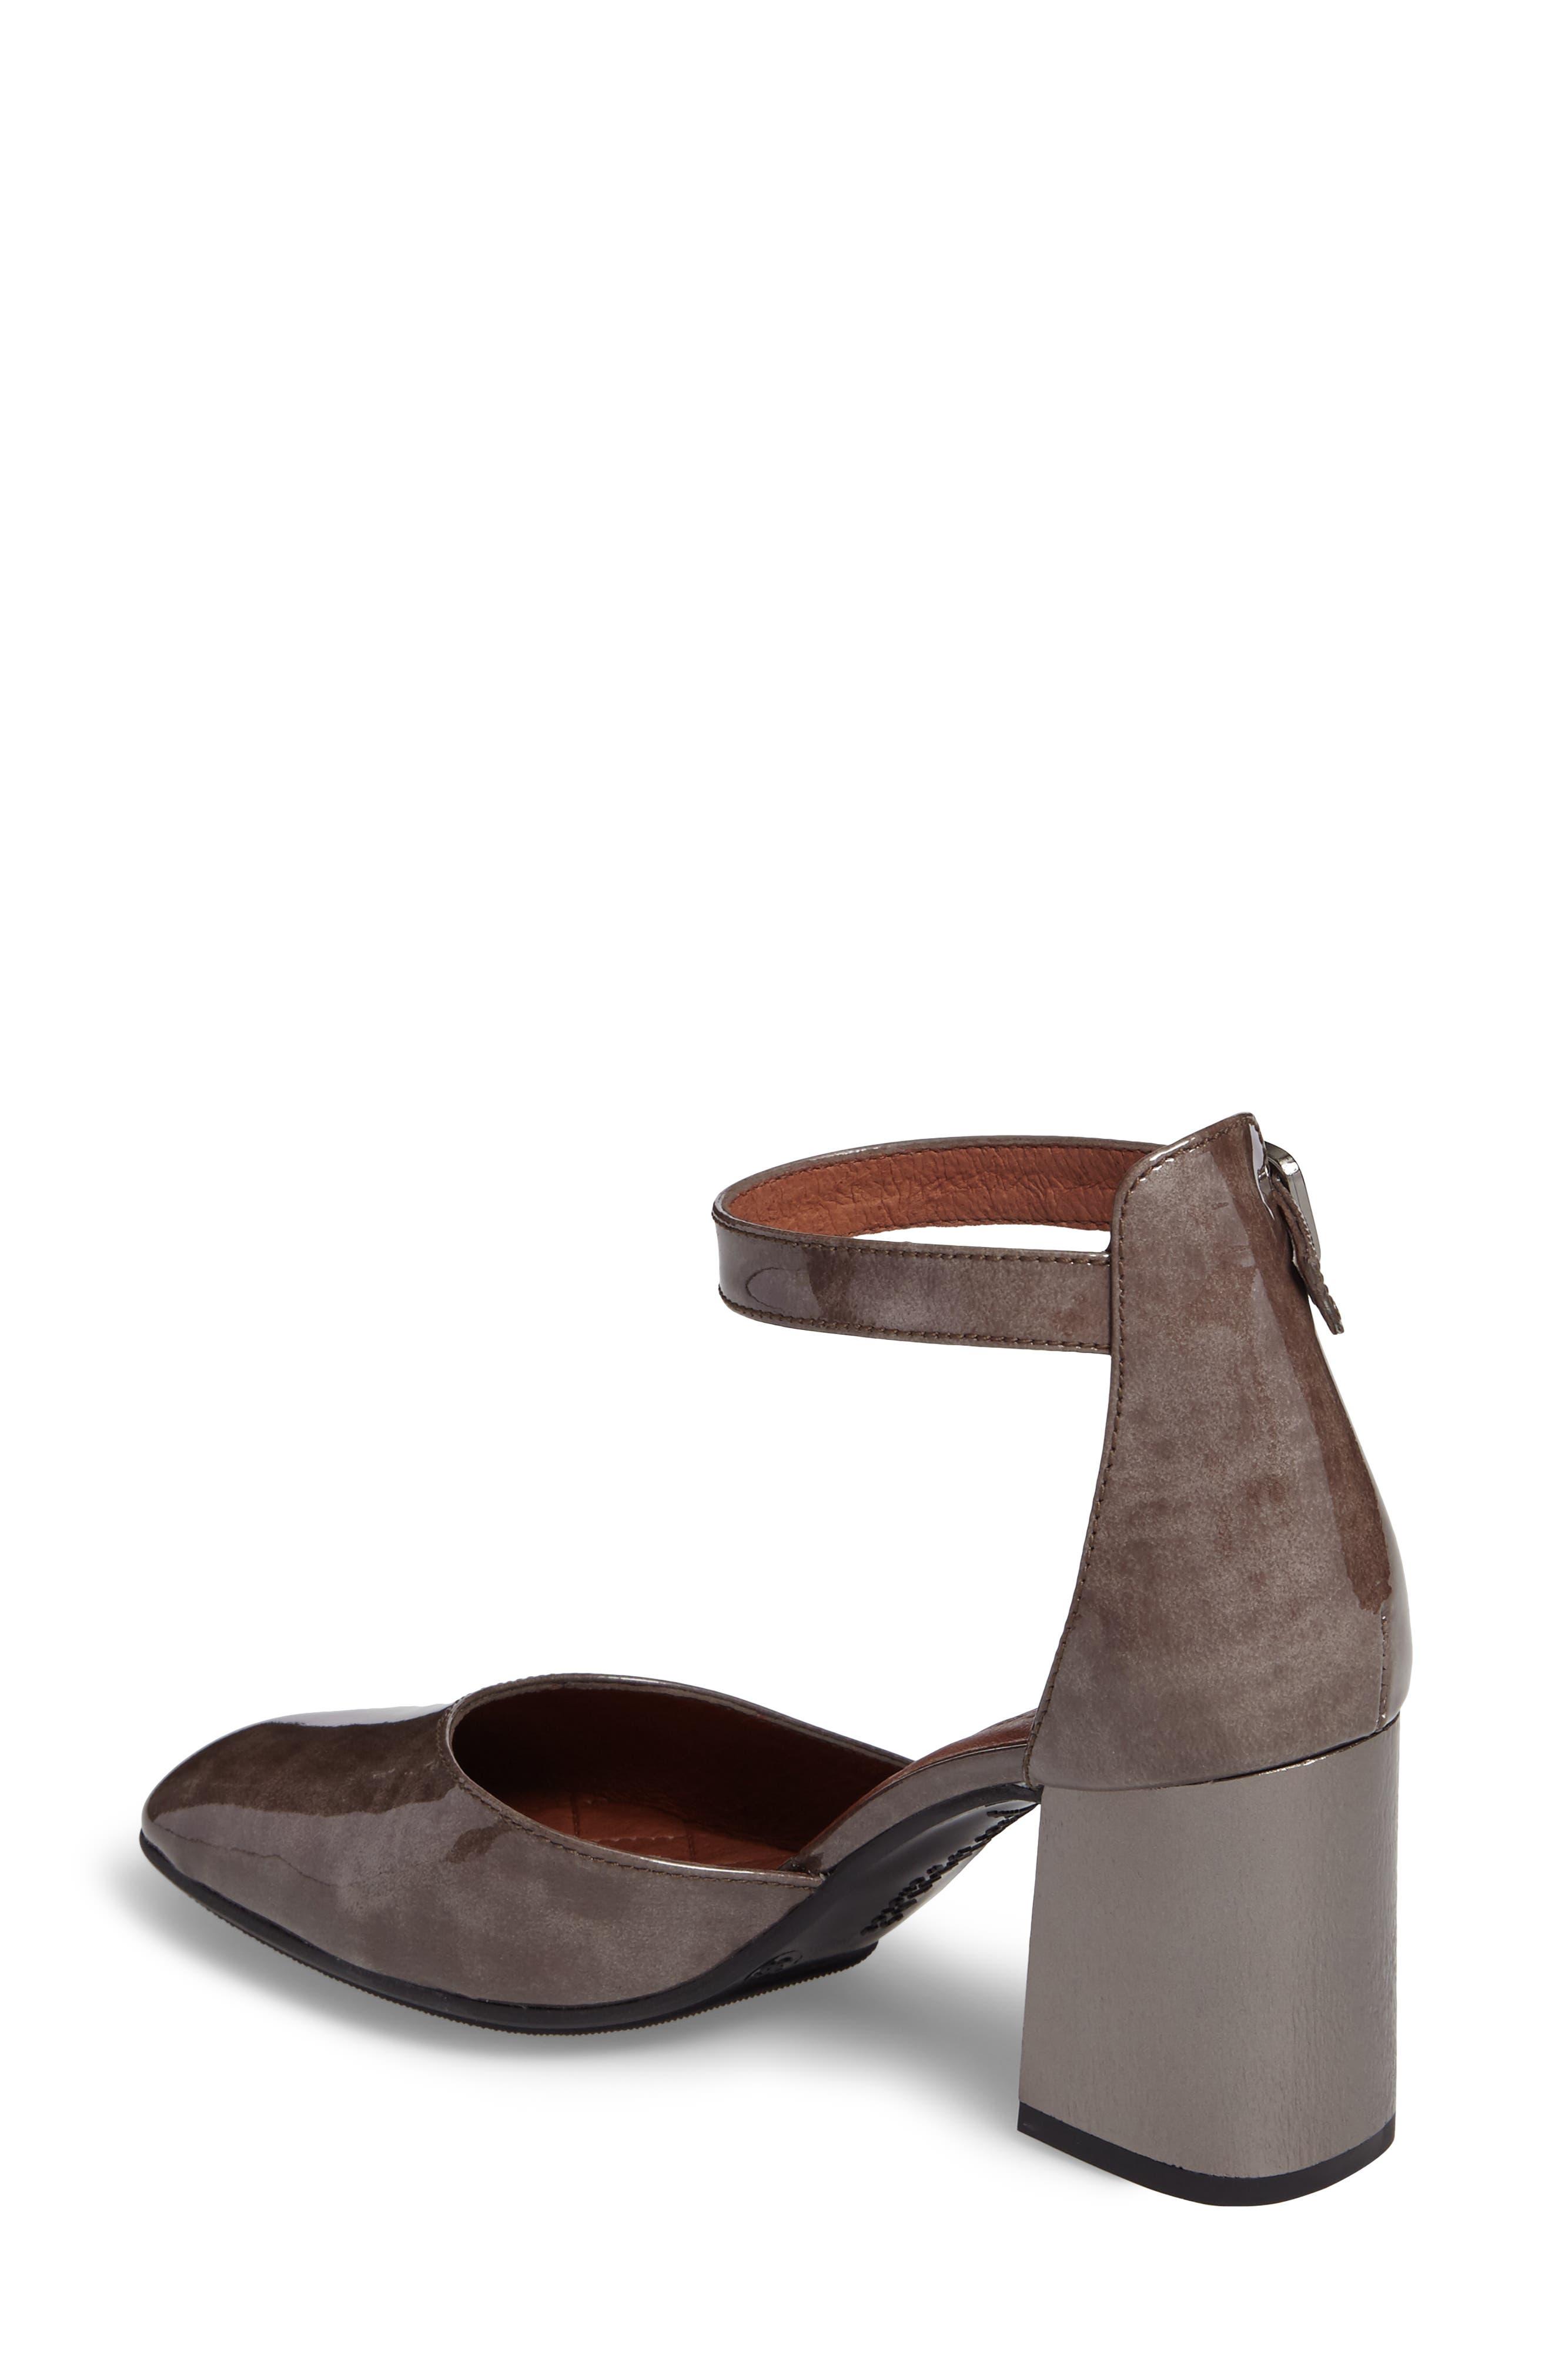 Paulette Flared Heel Pump,                             Alternate thumbnail 2, color,                             Vision Leather